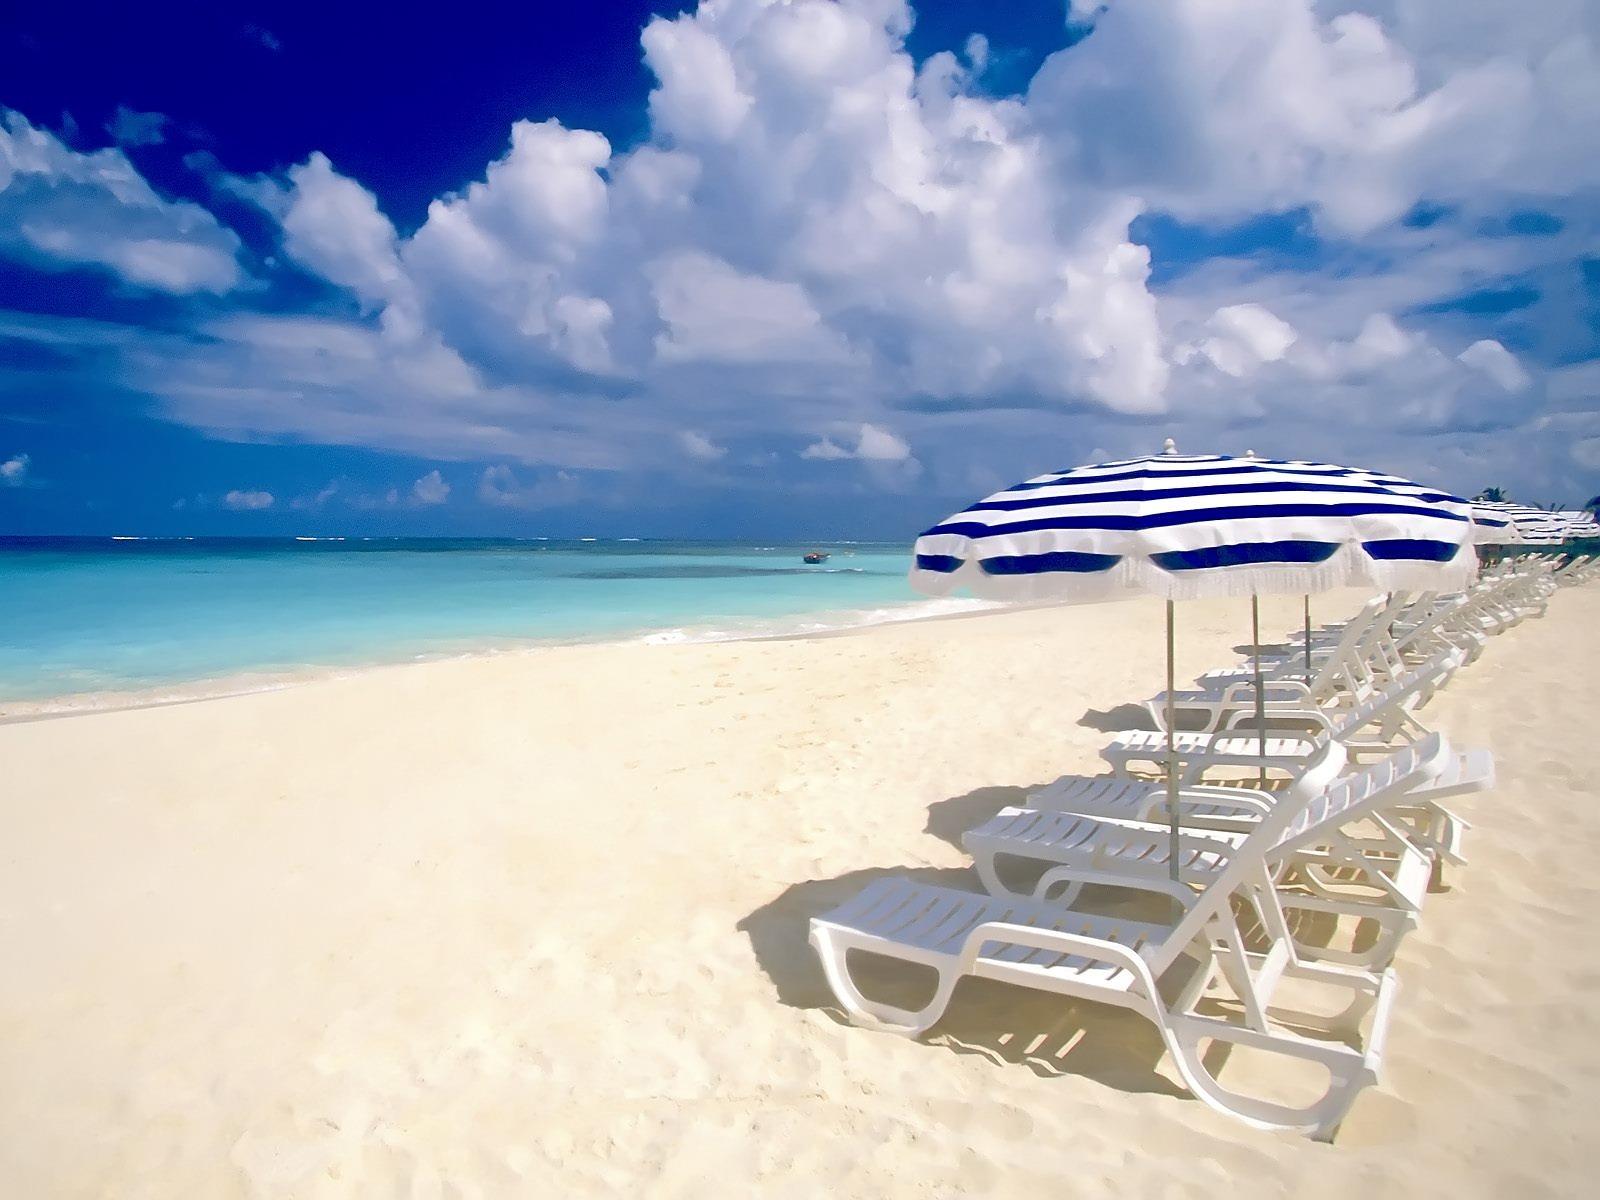 http://1.bp.blogspot.com/-vcf-rMaMs8k/TmeaRZ91xyI/AAAAAAAAFkE/88PJe187hTs/s1600/Hd+beach+wallpaper2.jpg